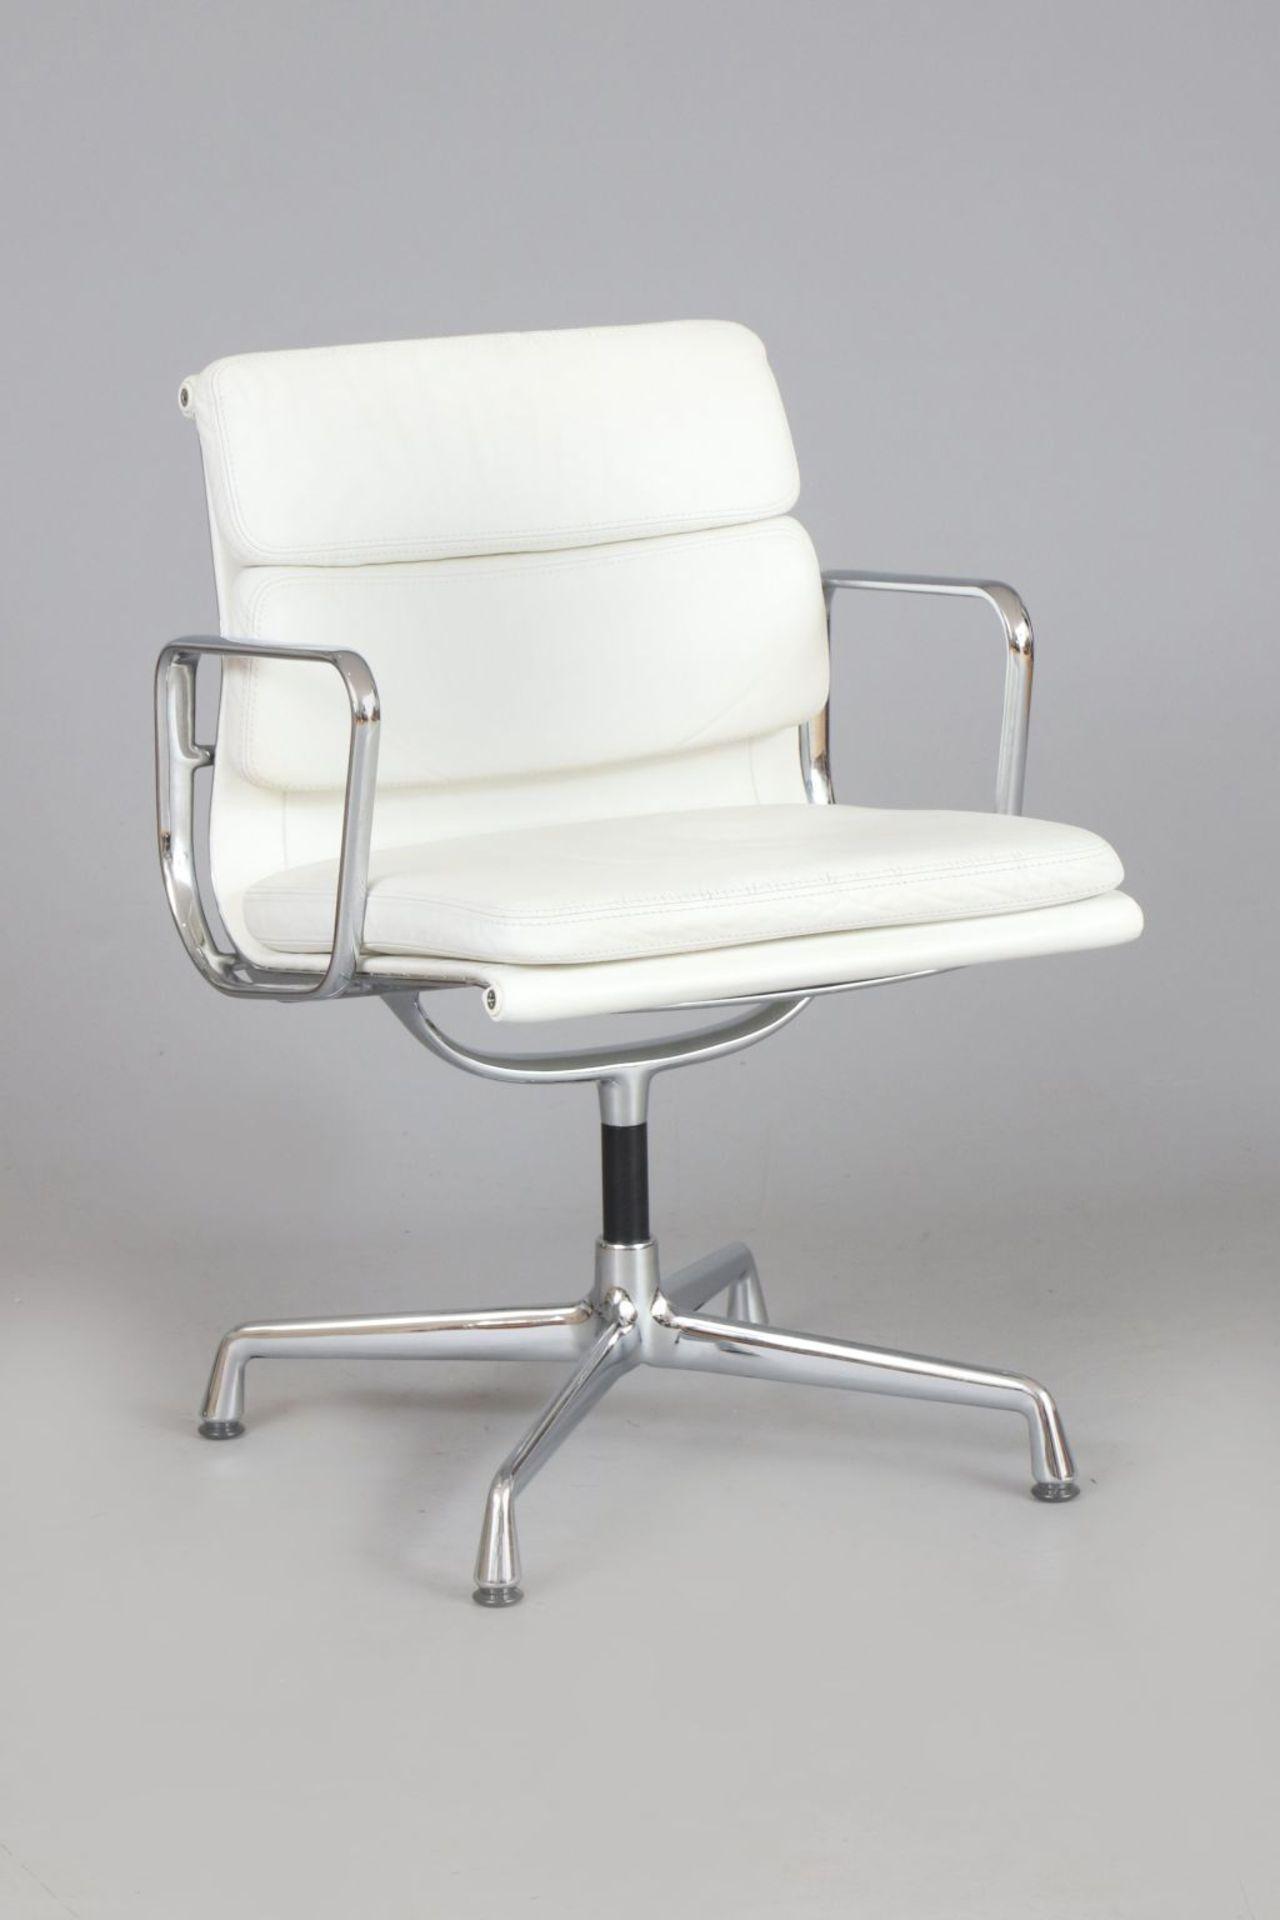 CHARLES & RAY EAMES Aluminium Chair - Soft Pad - EA 208